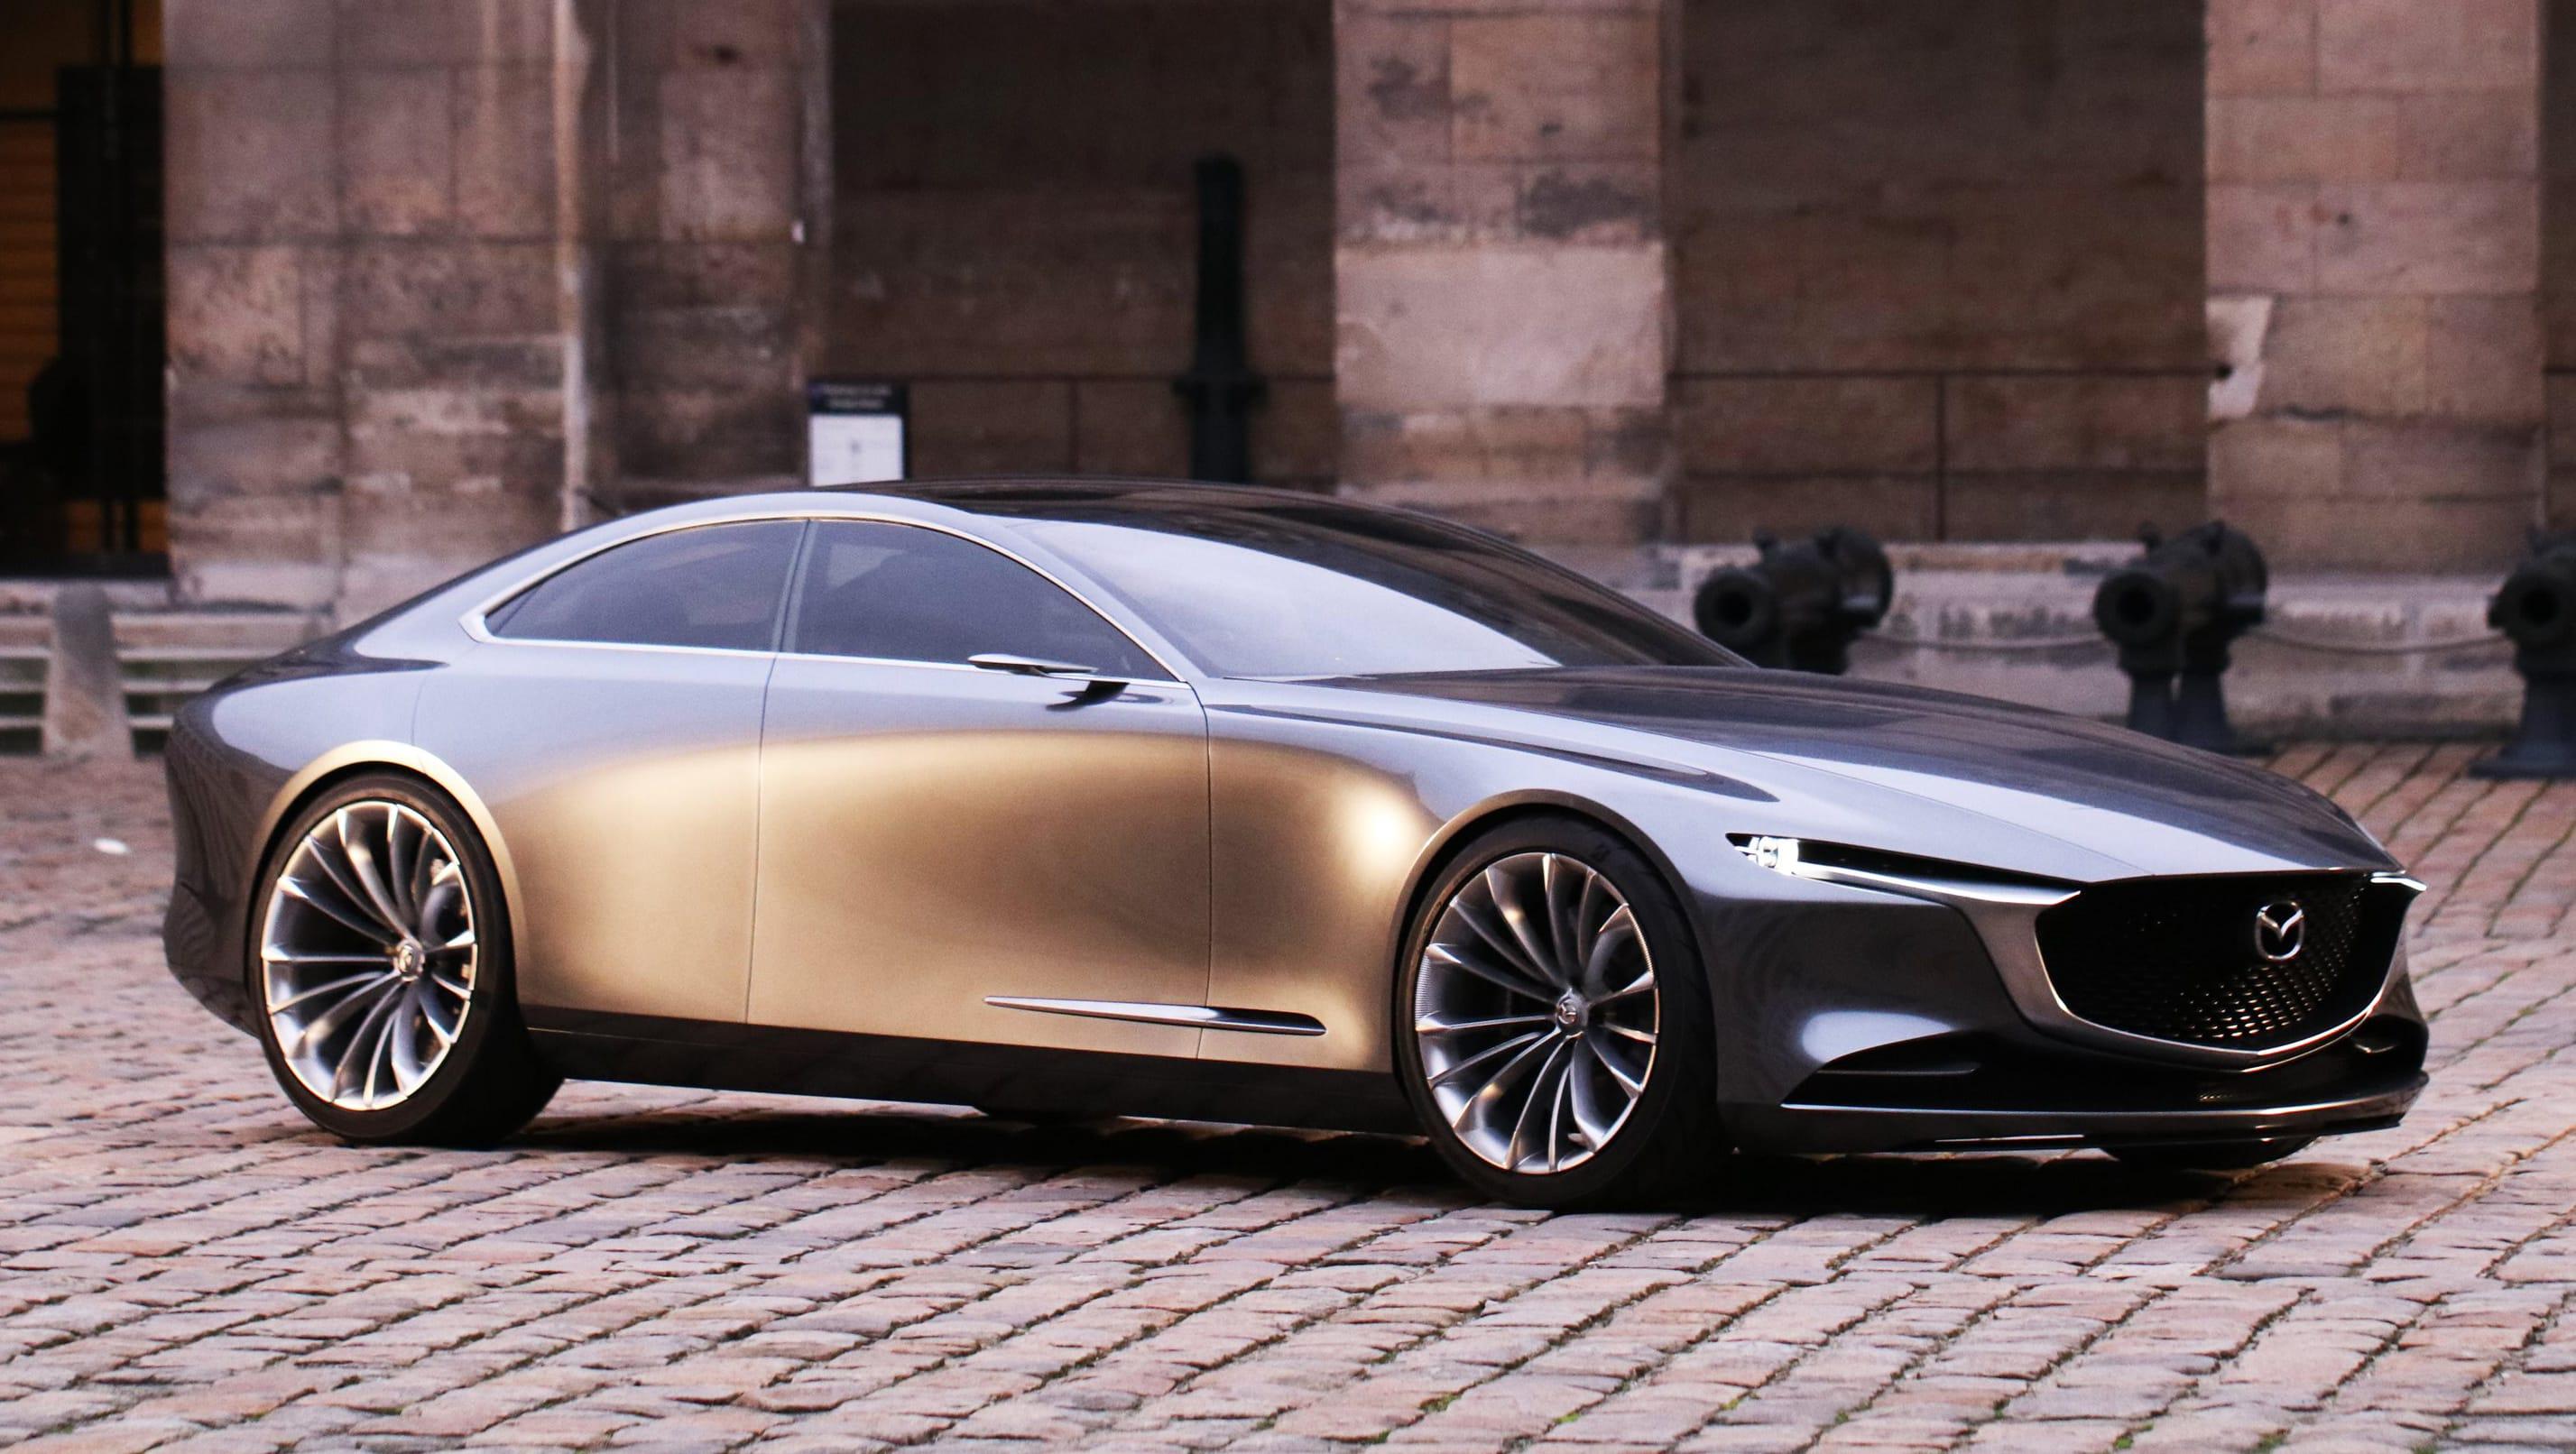 2021 Mazda 6 New Review